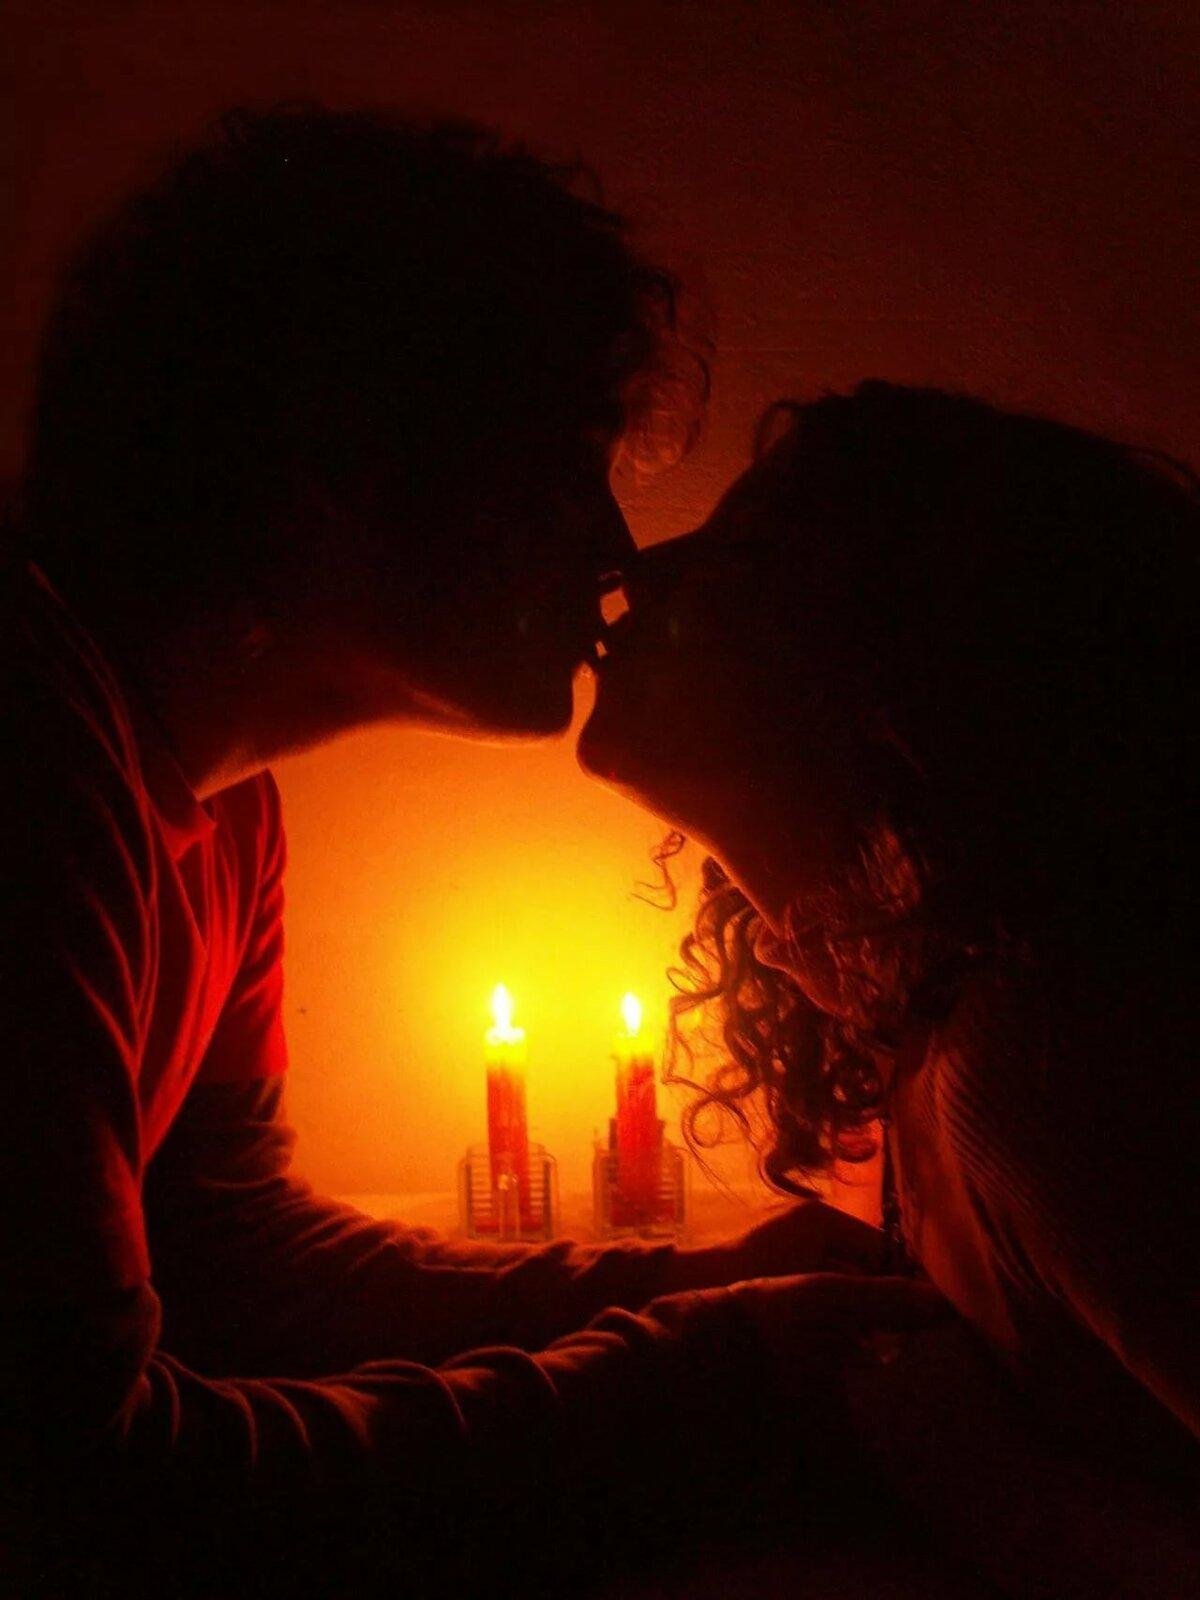 Картинка при свечах